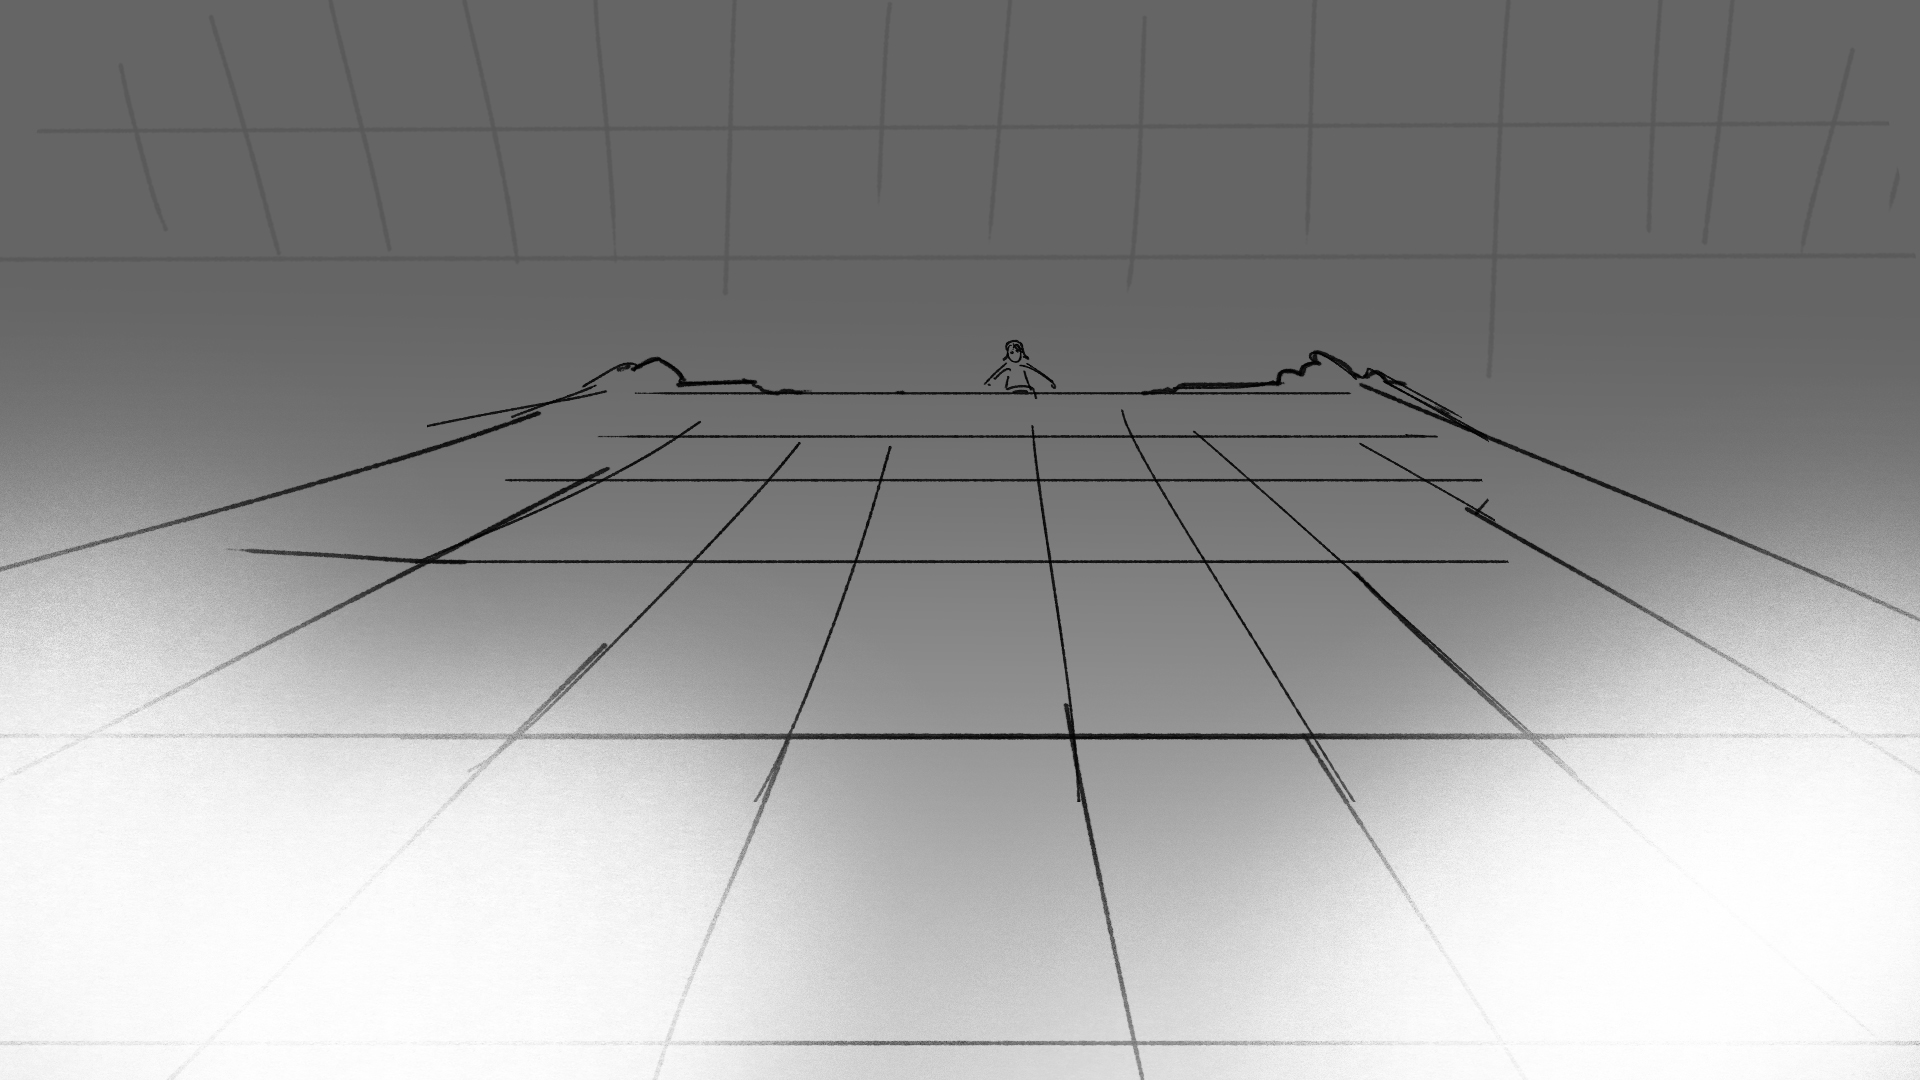 GreatC_Rooftop_062.jpg